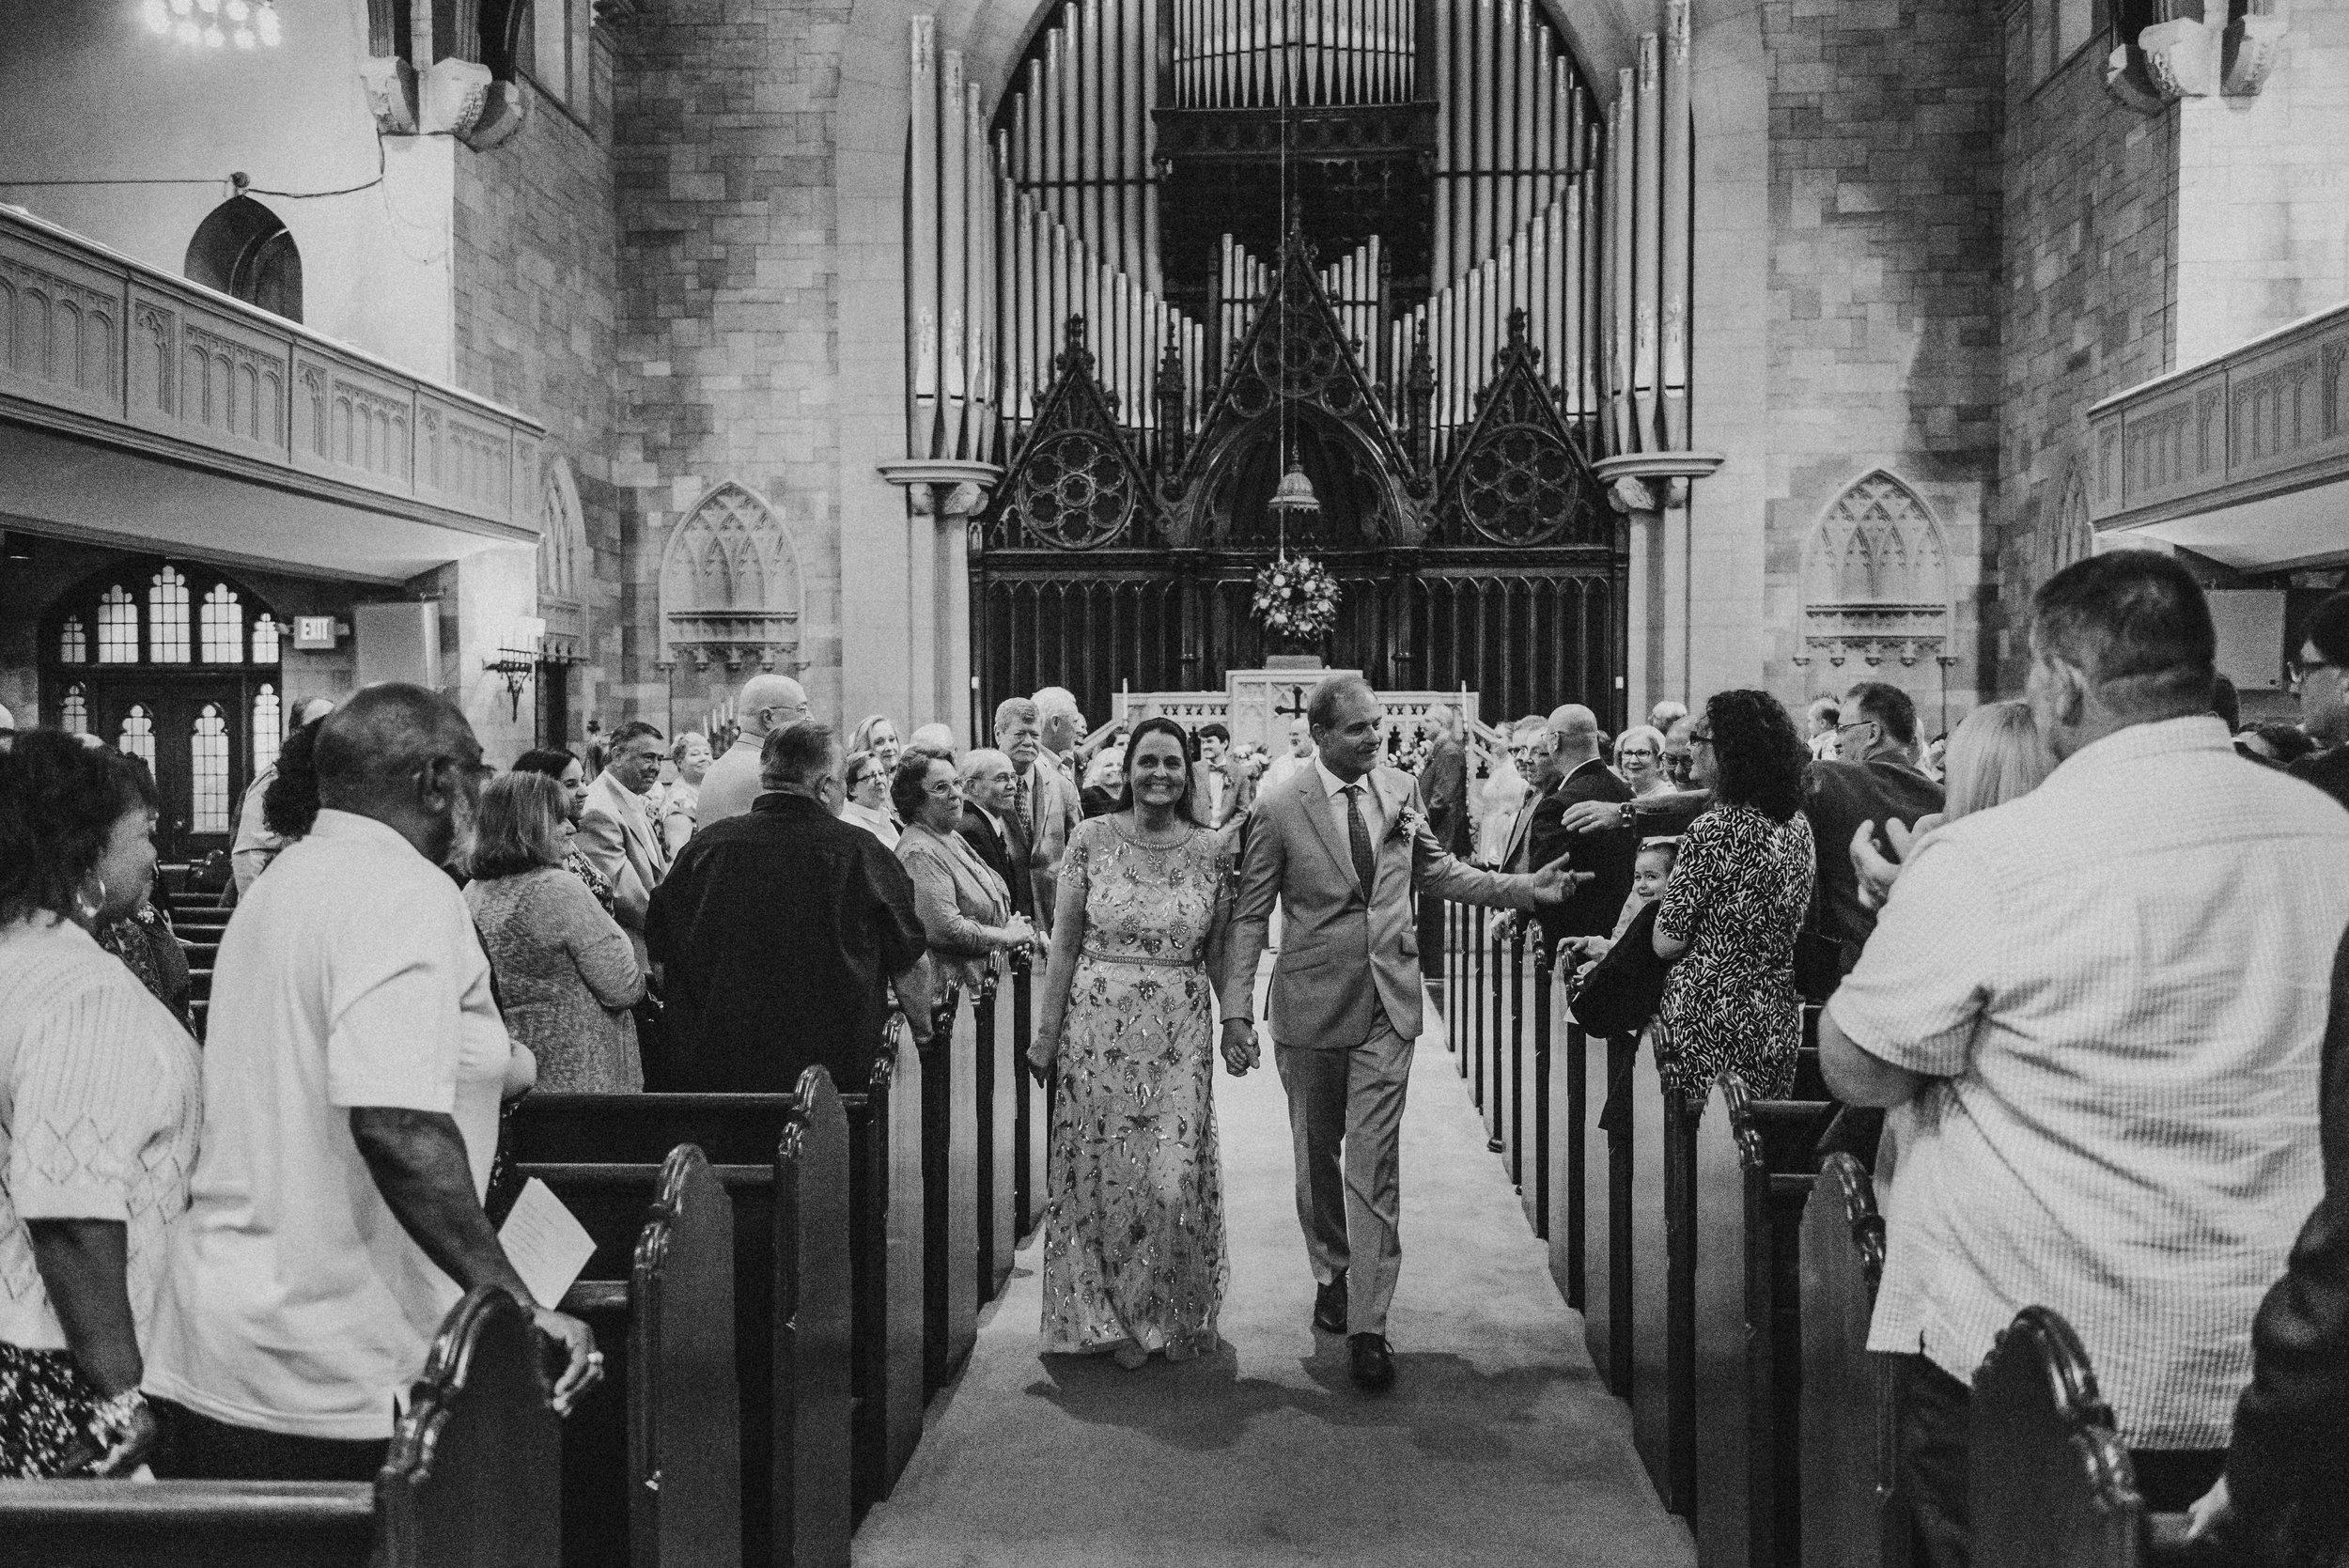 Gumlaw_Wedding_Ceremony-107.jpg